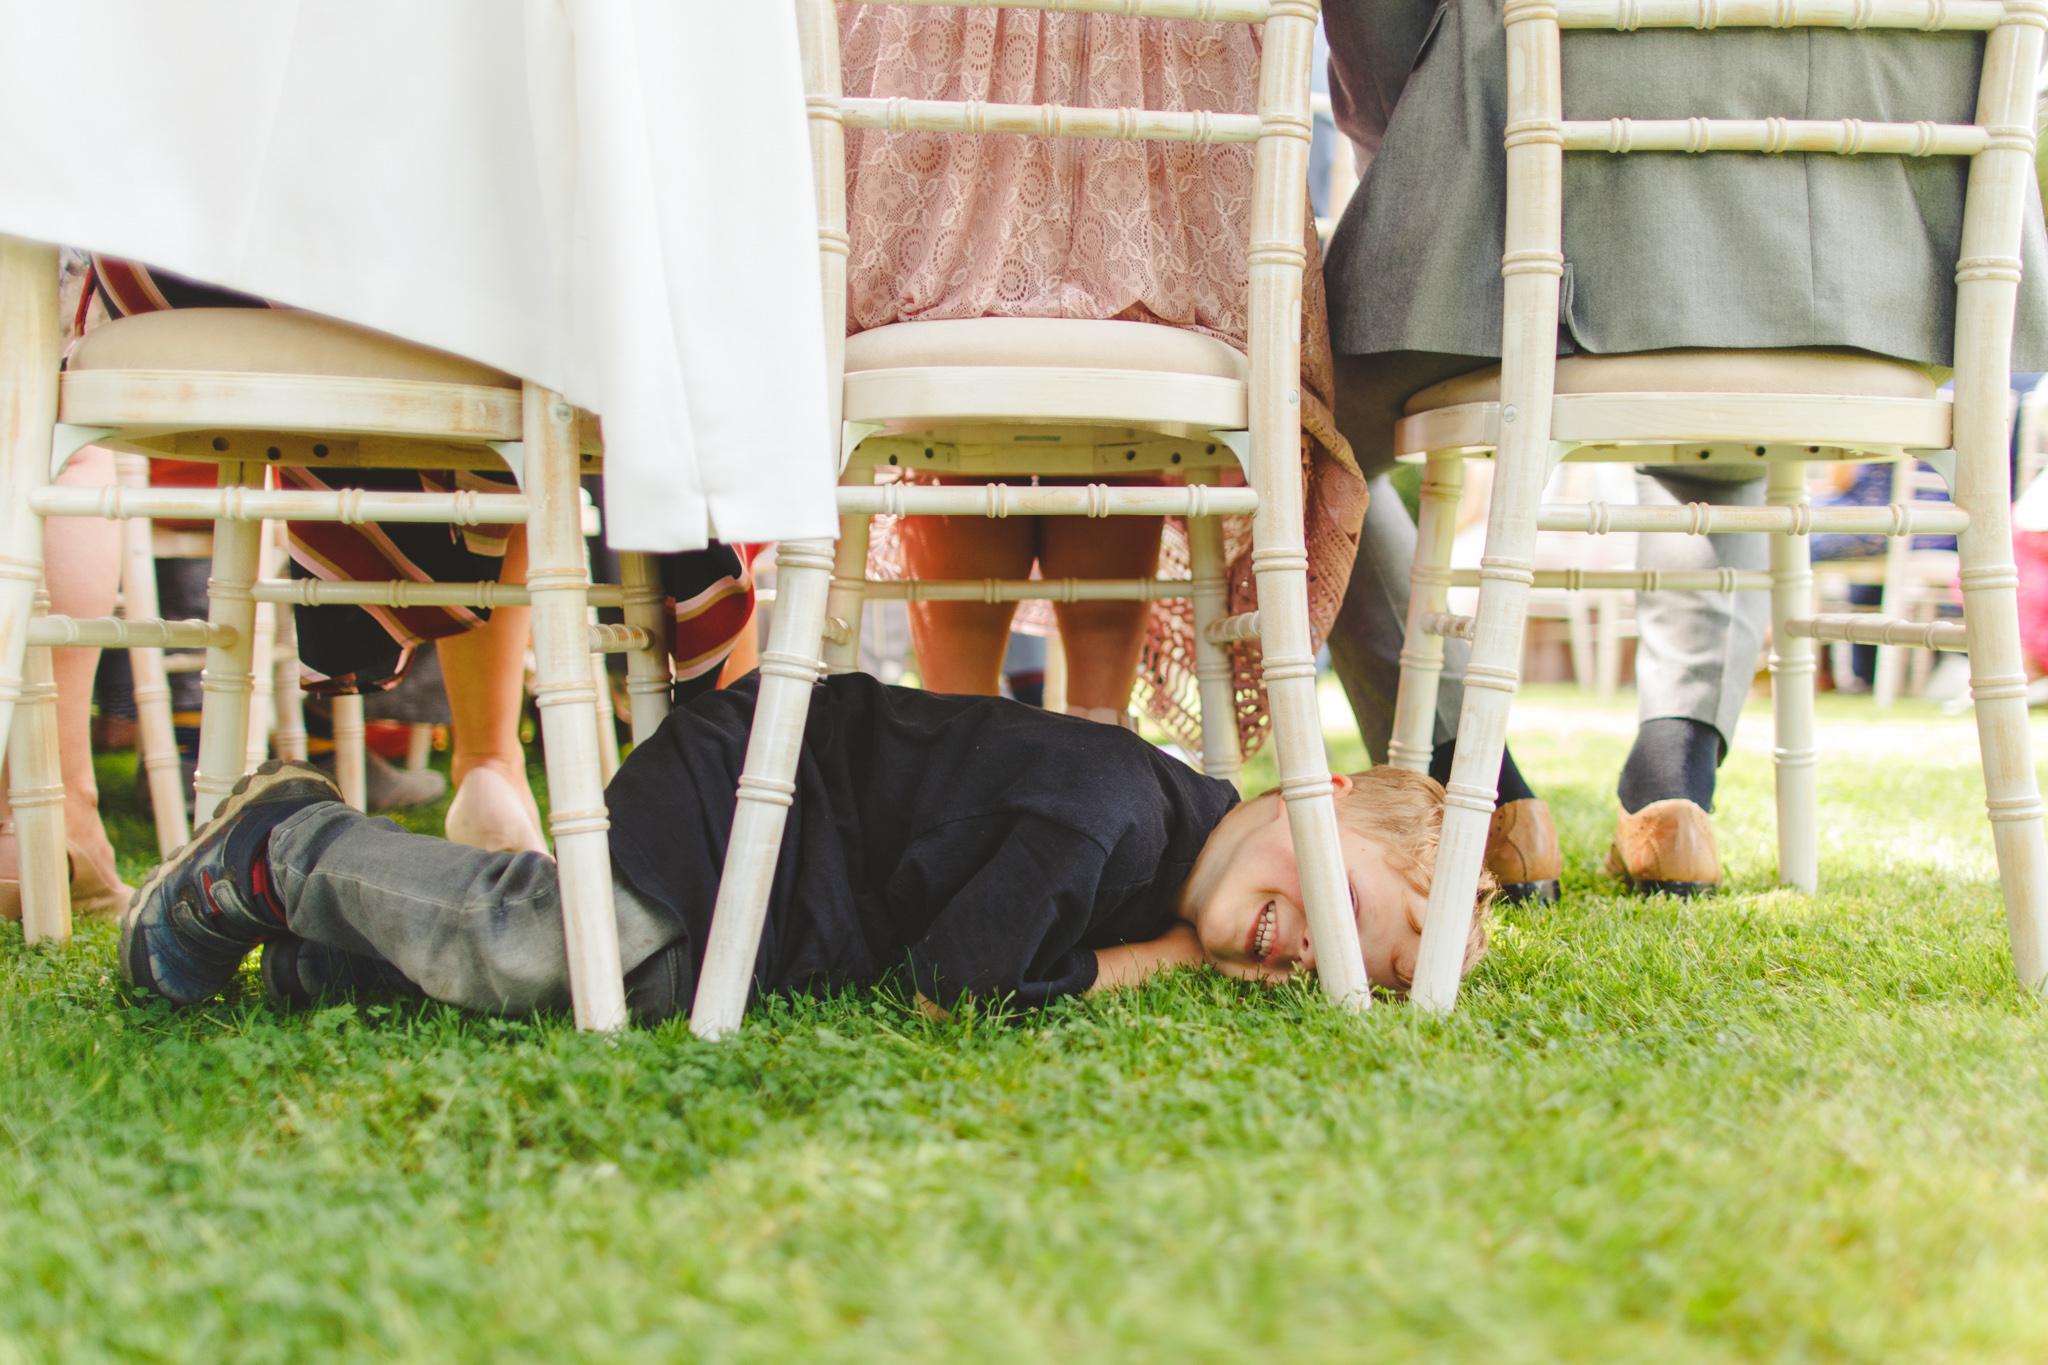 derbyshire-wedding-photographer-videographer-camera-hannah-76.jpg